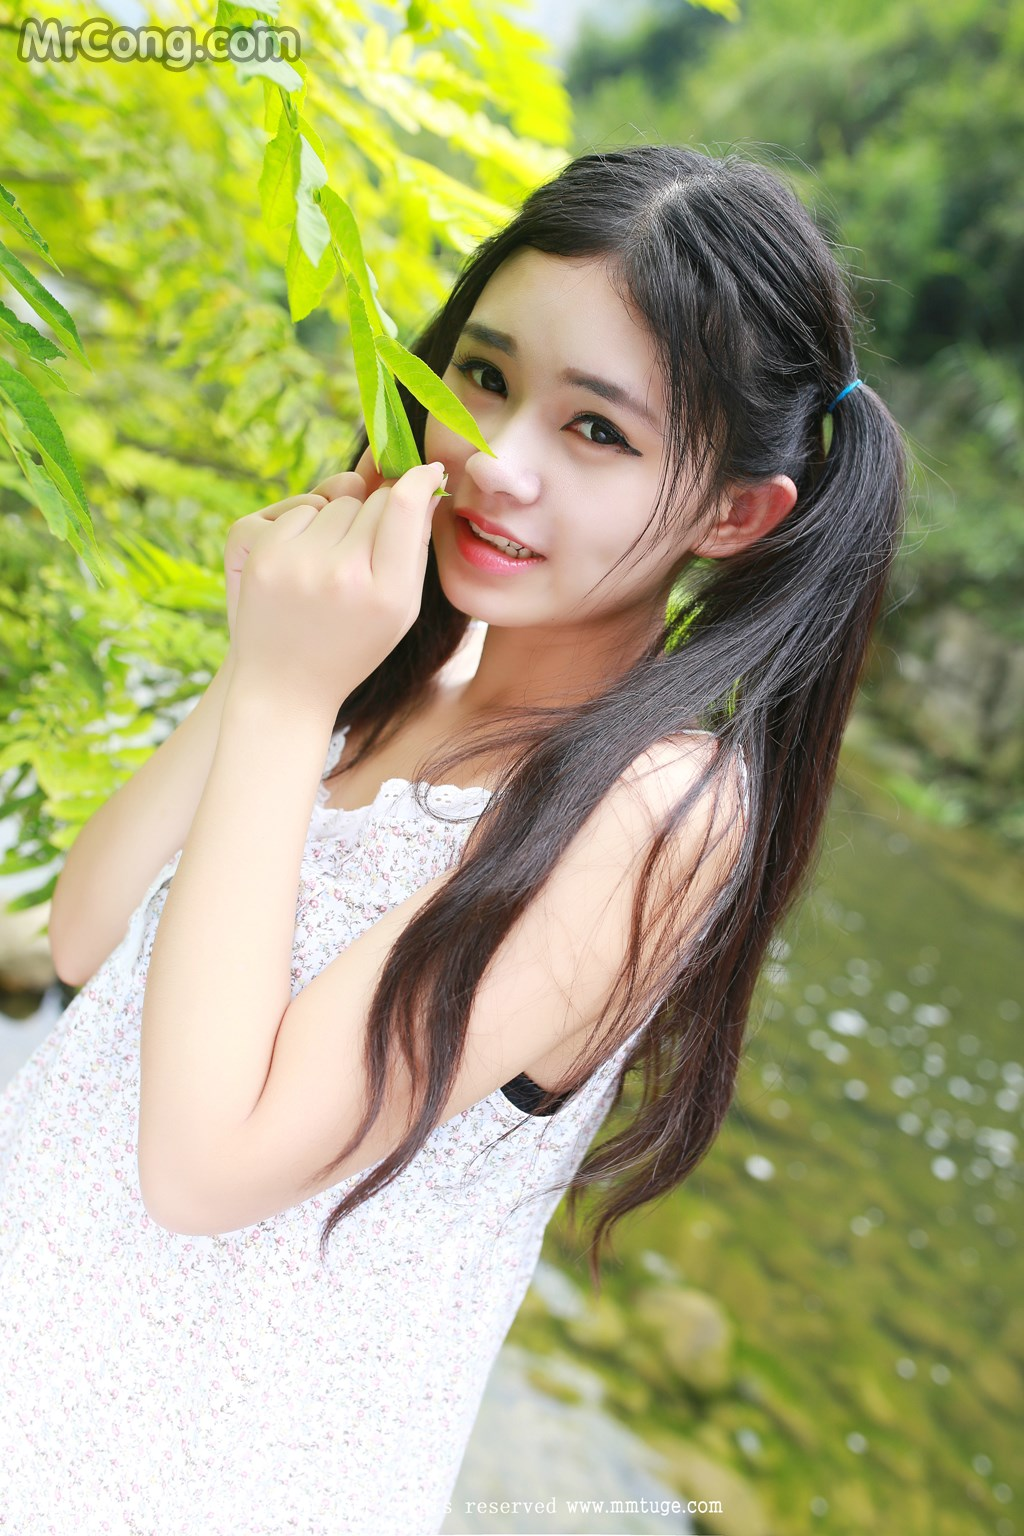 TGOD 2015-08-20: Model Guo Wei Bao Zi (果味包子) (45P)